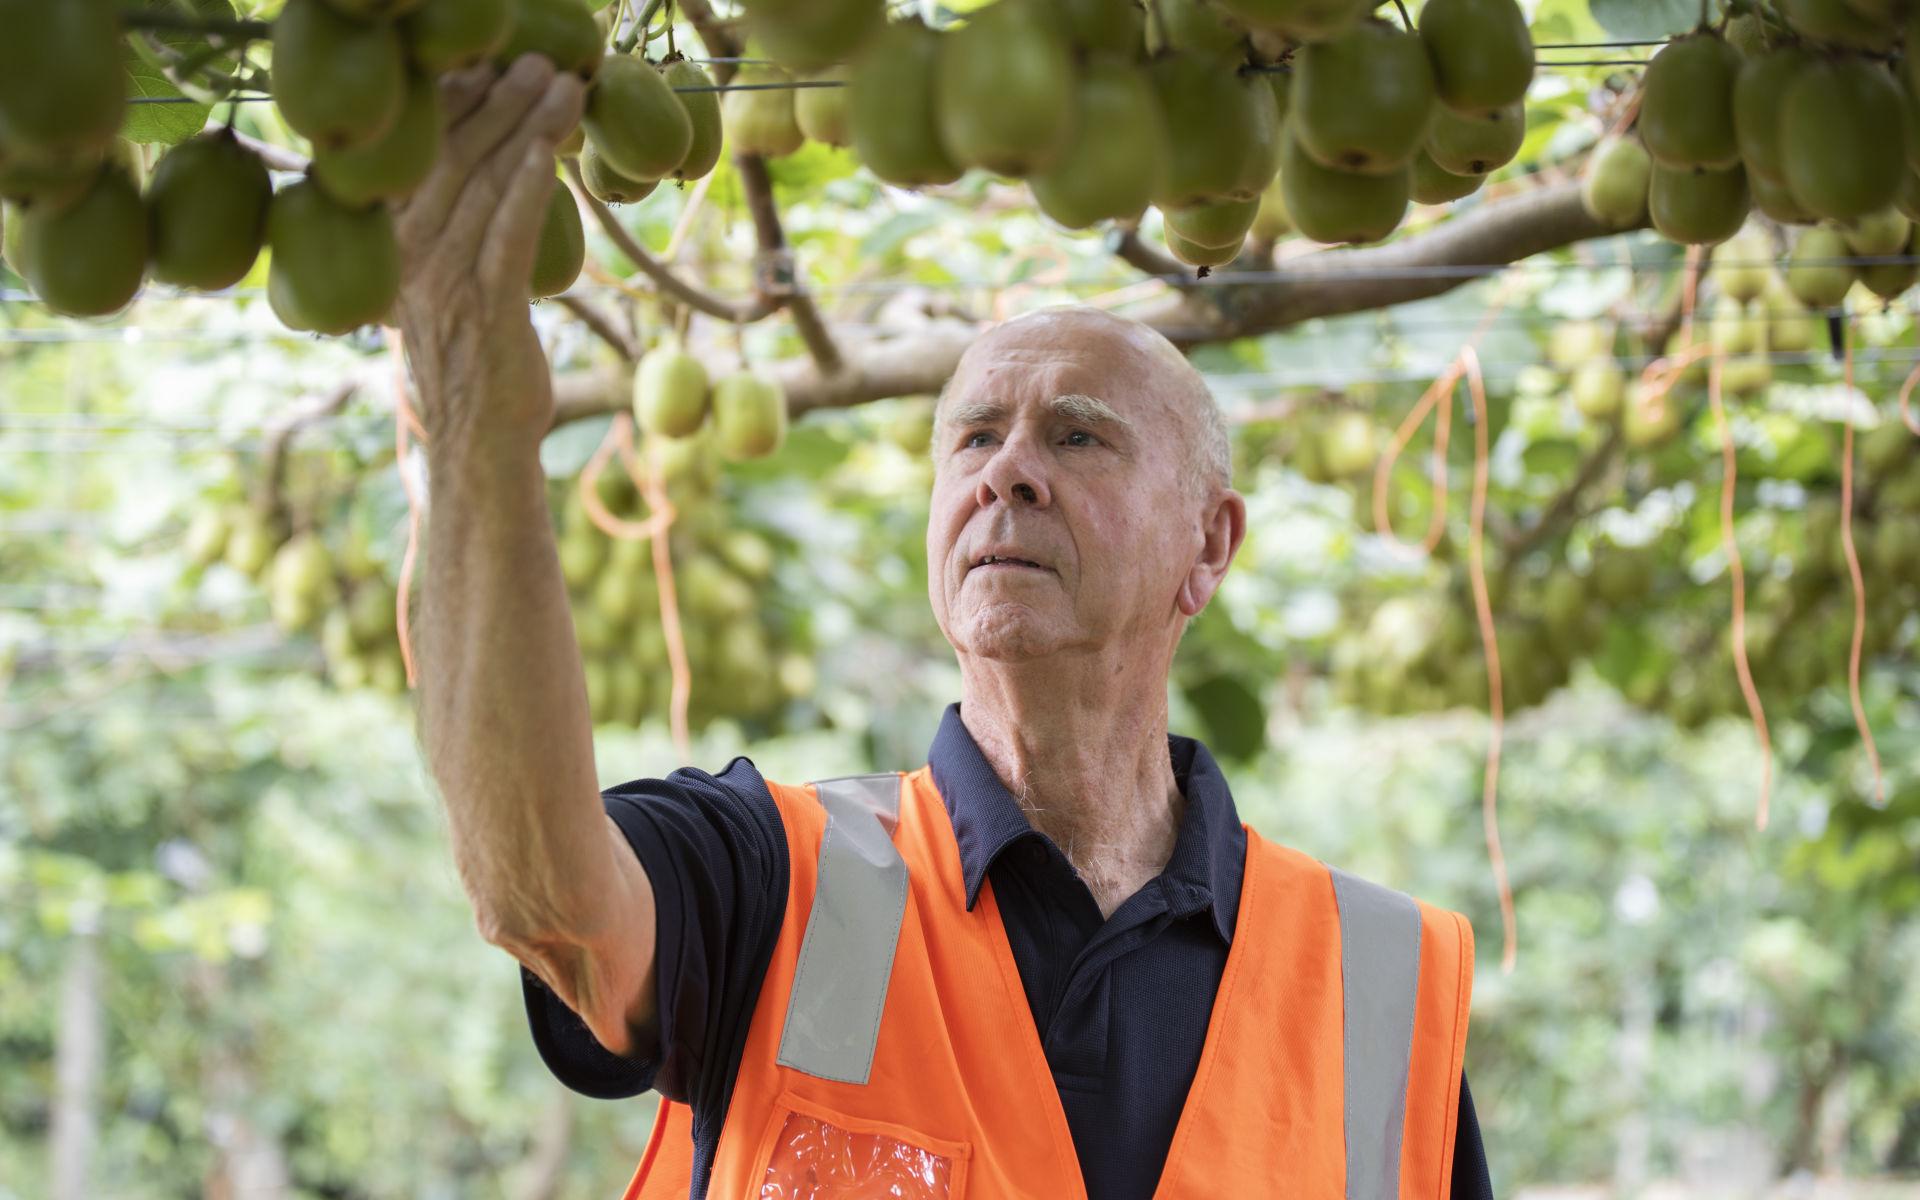 Scientist Russell Lowe wins Plant Raiser's Award for kiwifruit cultivar